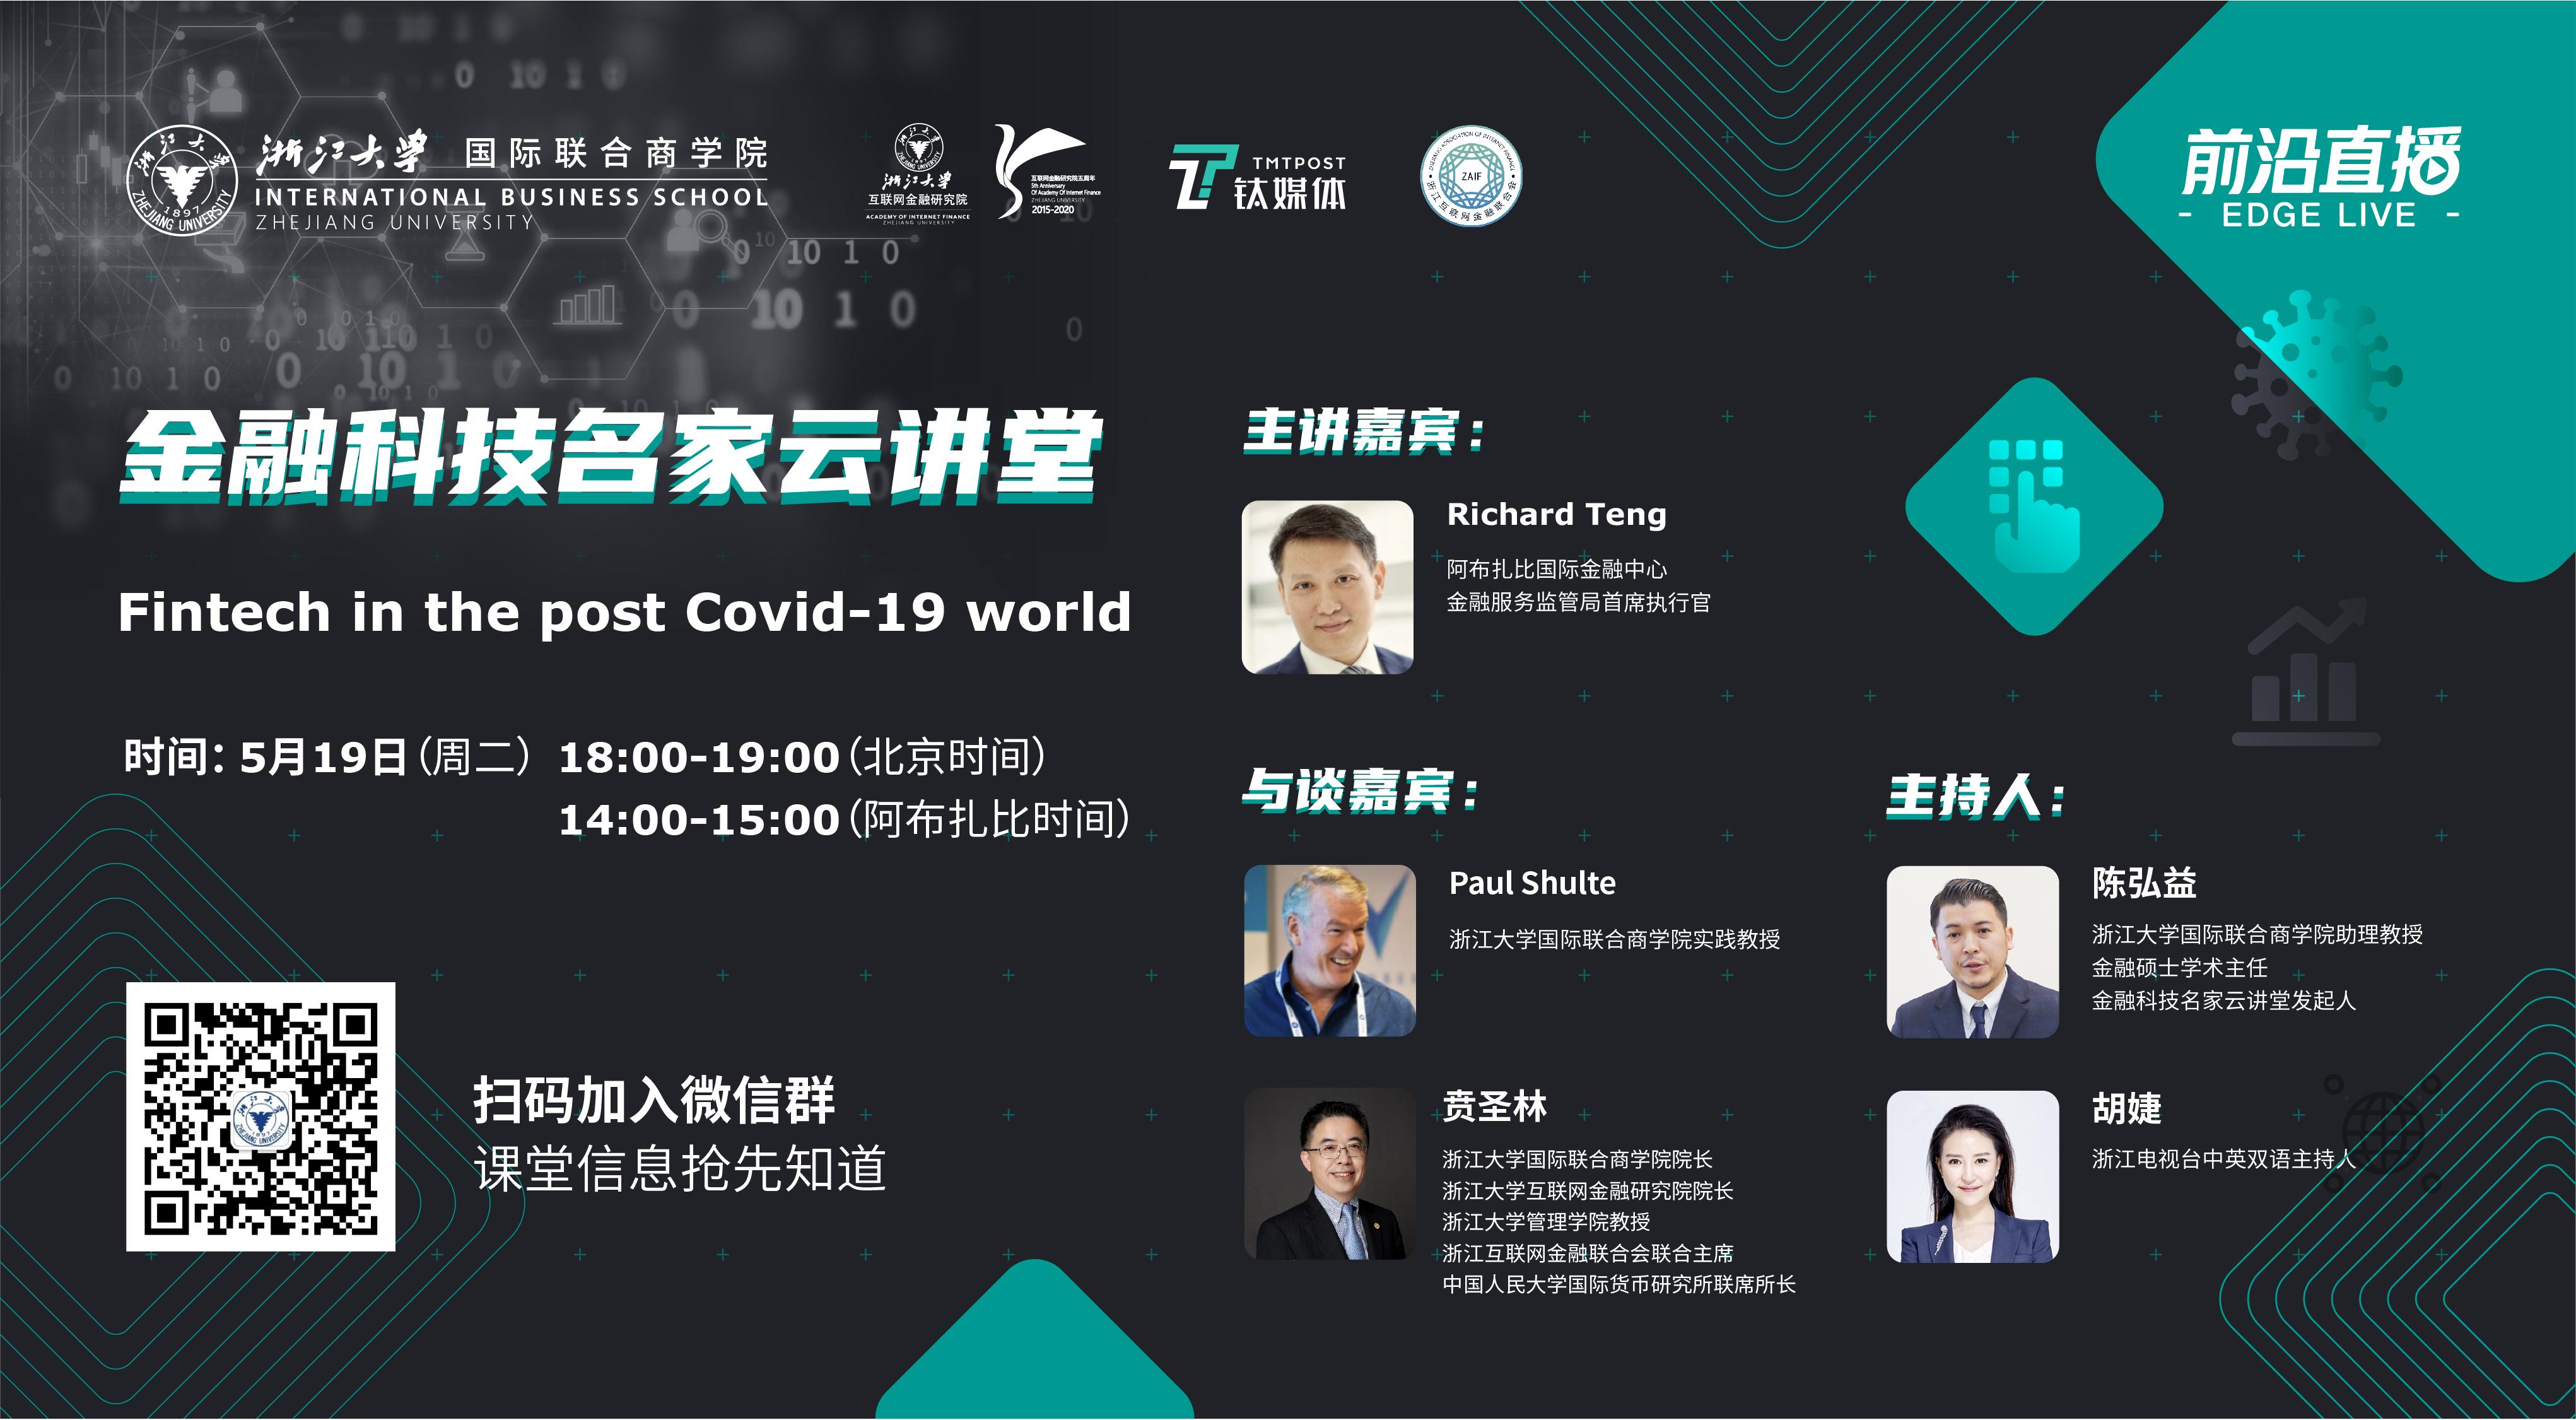 金融科技名家云讲堂②:Fintech in the post Covid-19 world